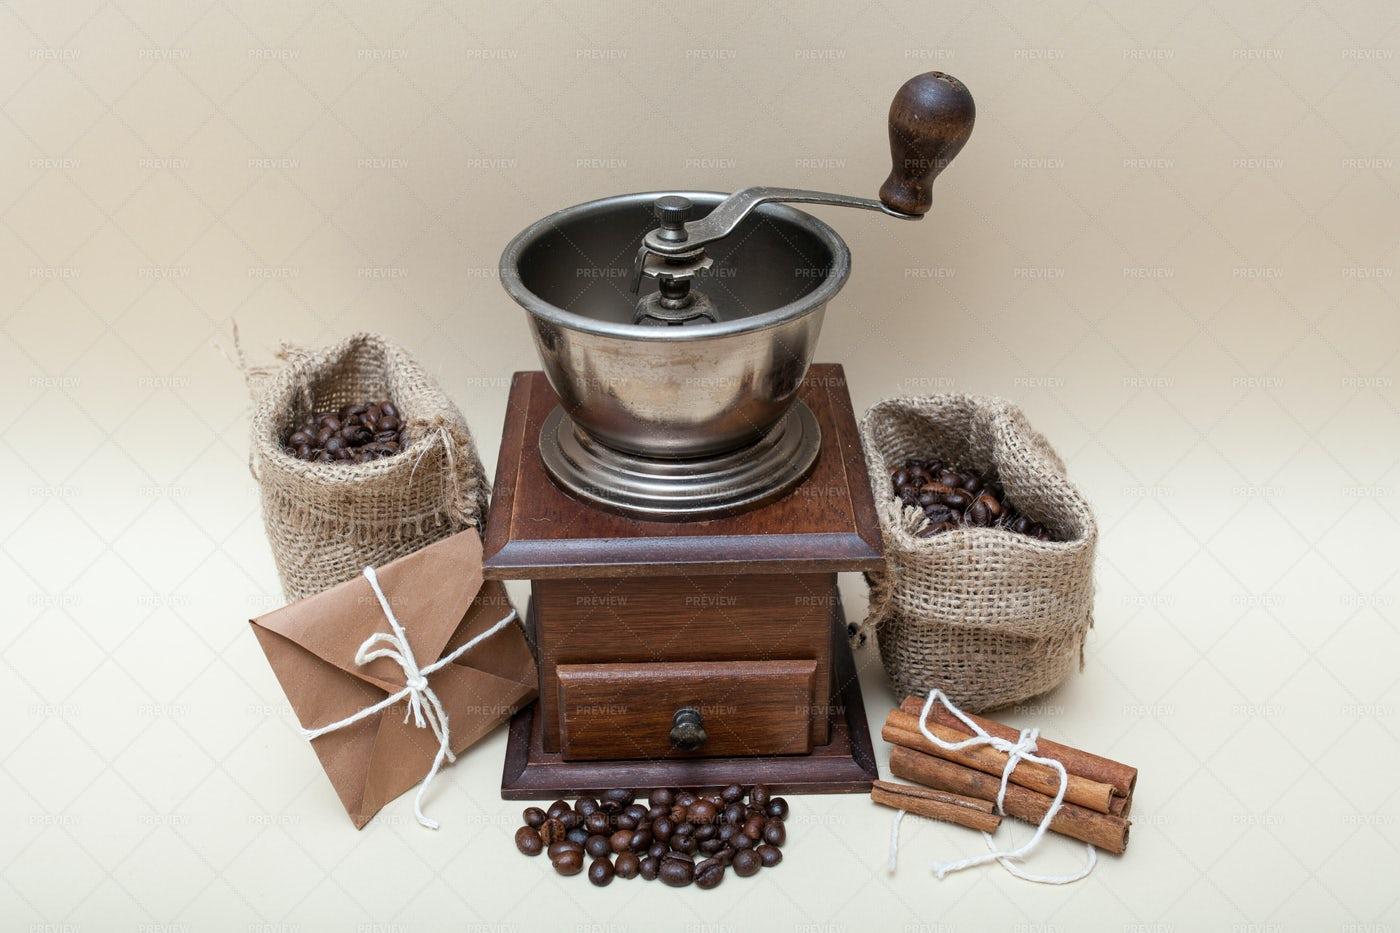 Antique Coffee Grinder: Stock Photos